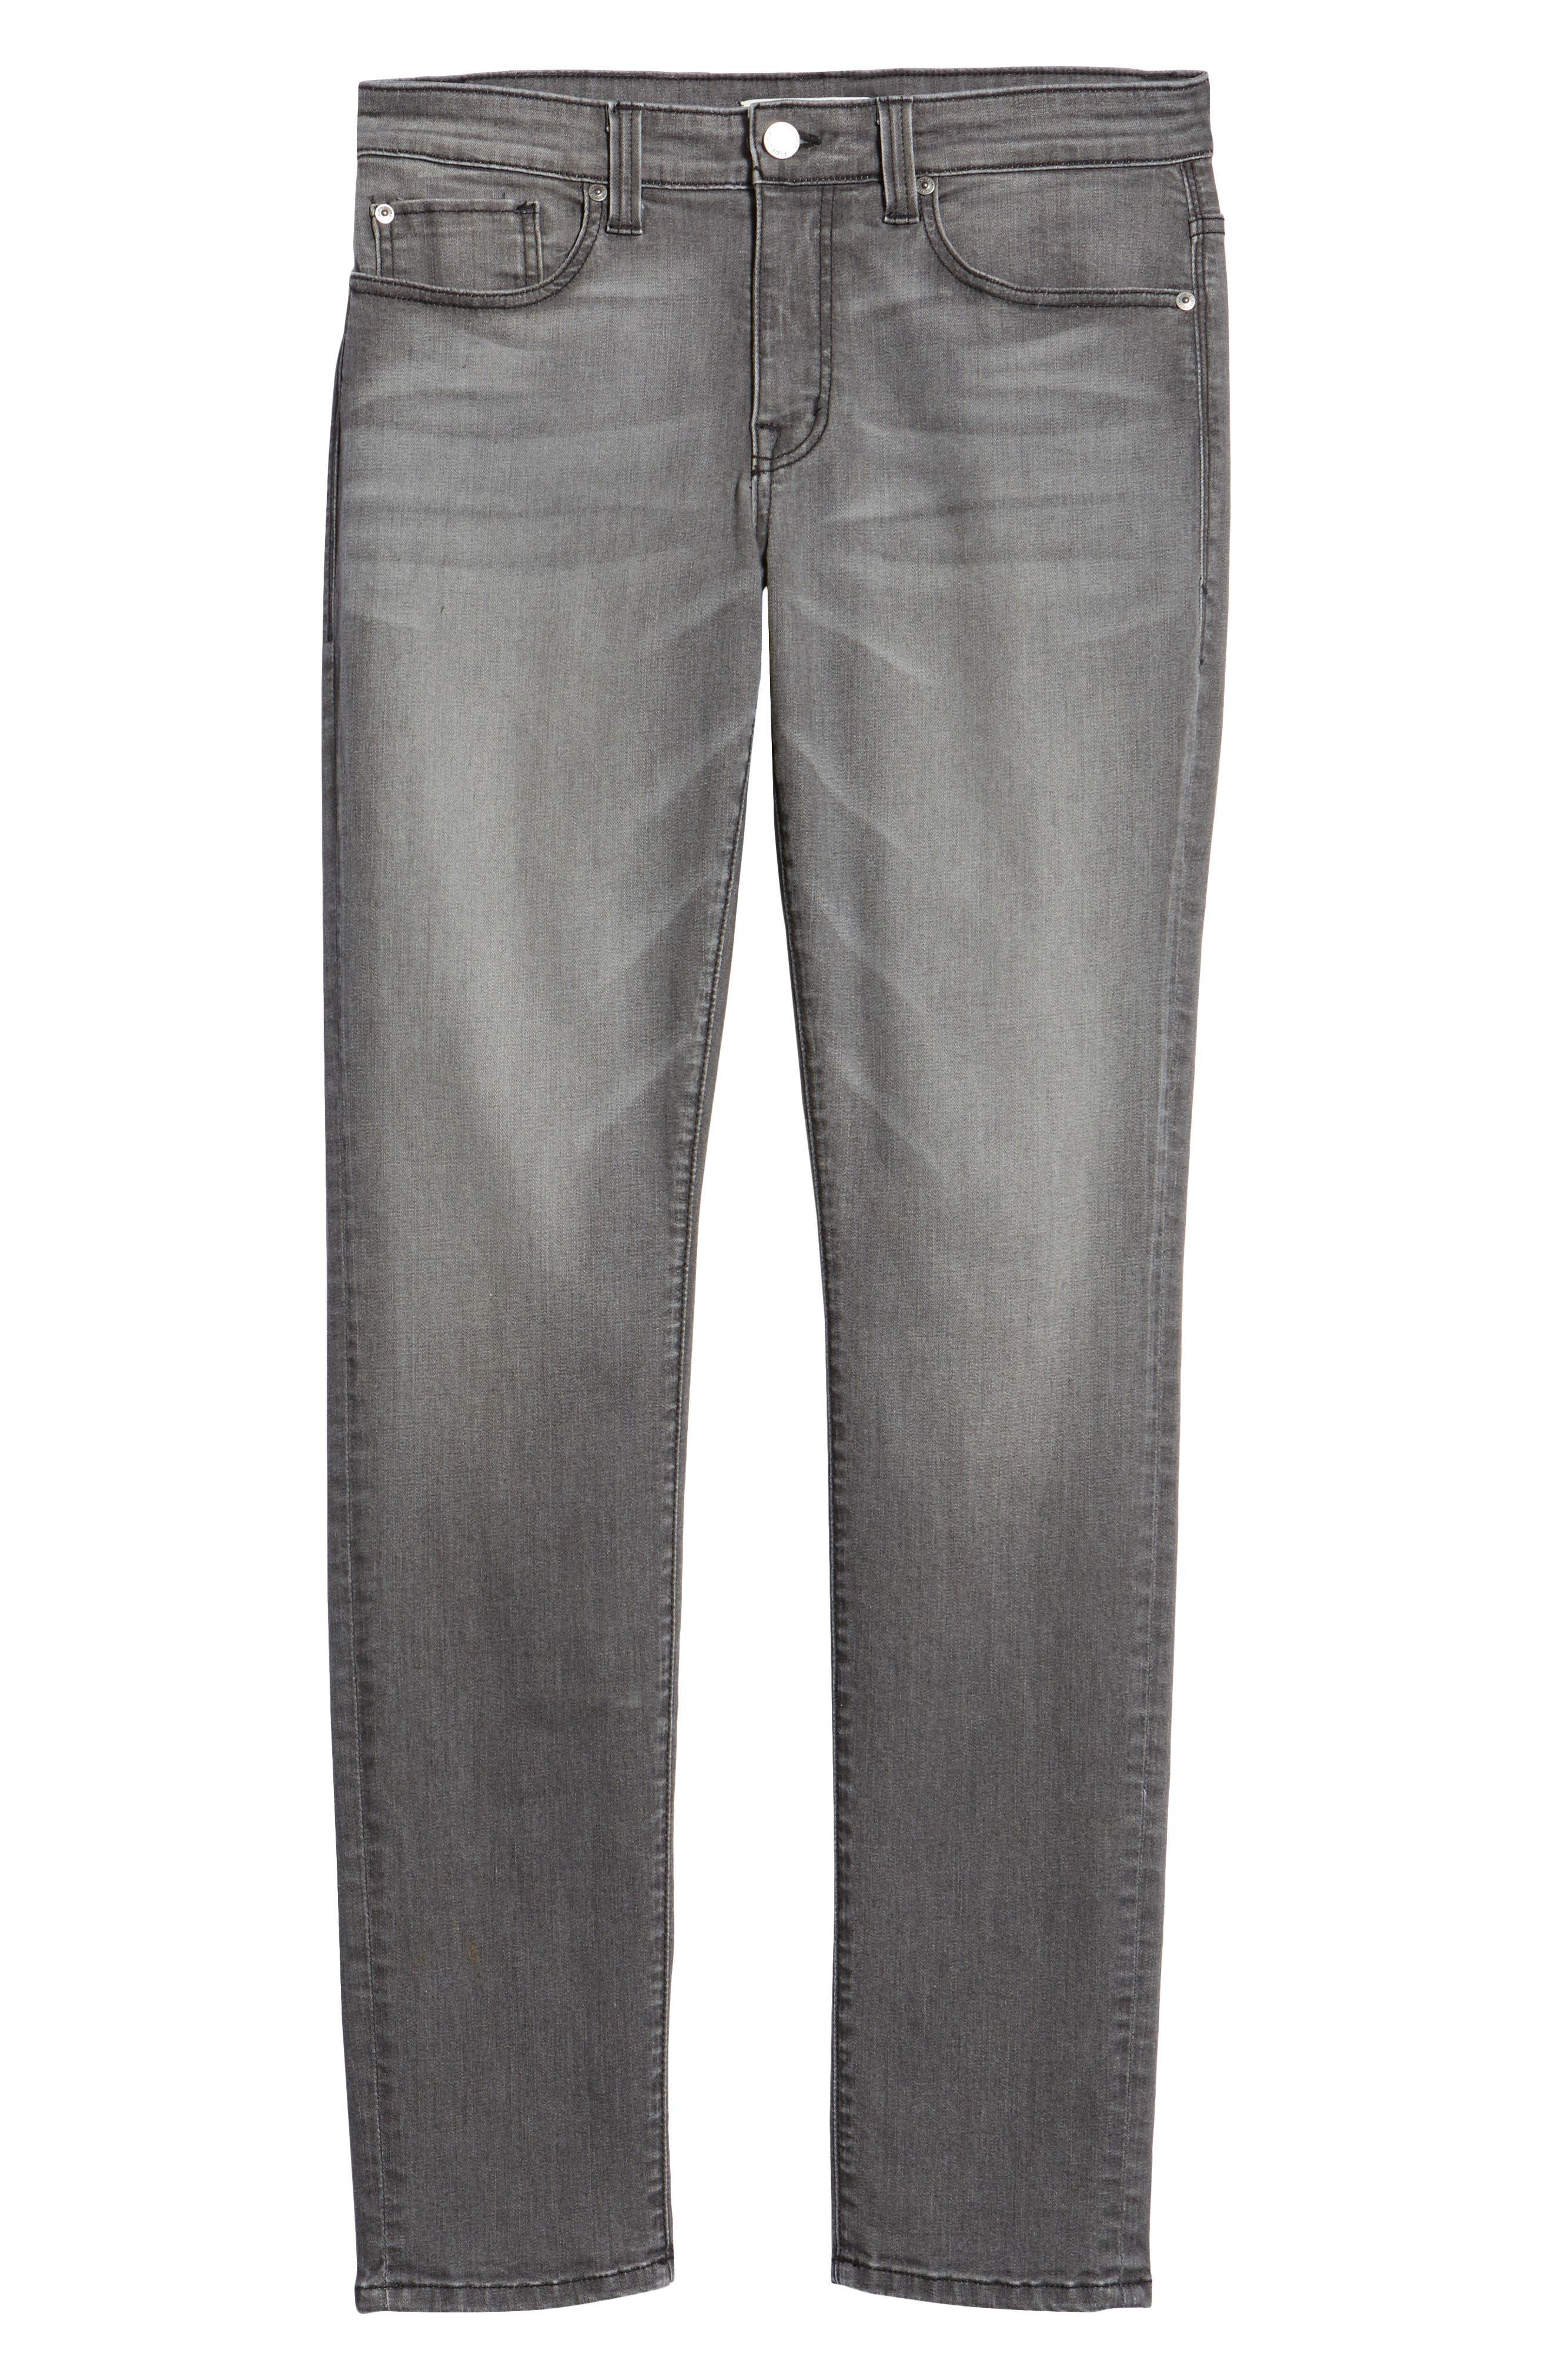 Torino Slim Fit Jeans,                             Alternate thumbnail 6, color,                             PHANTOM GREY